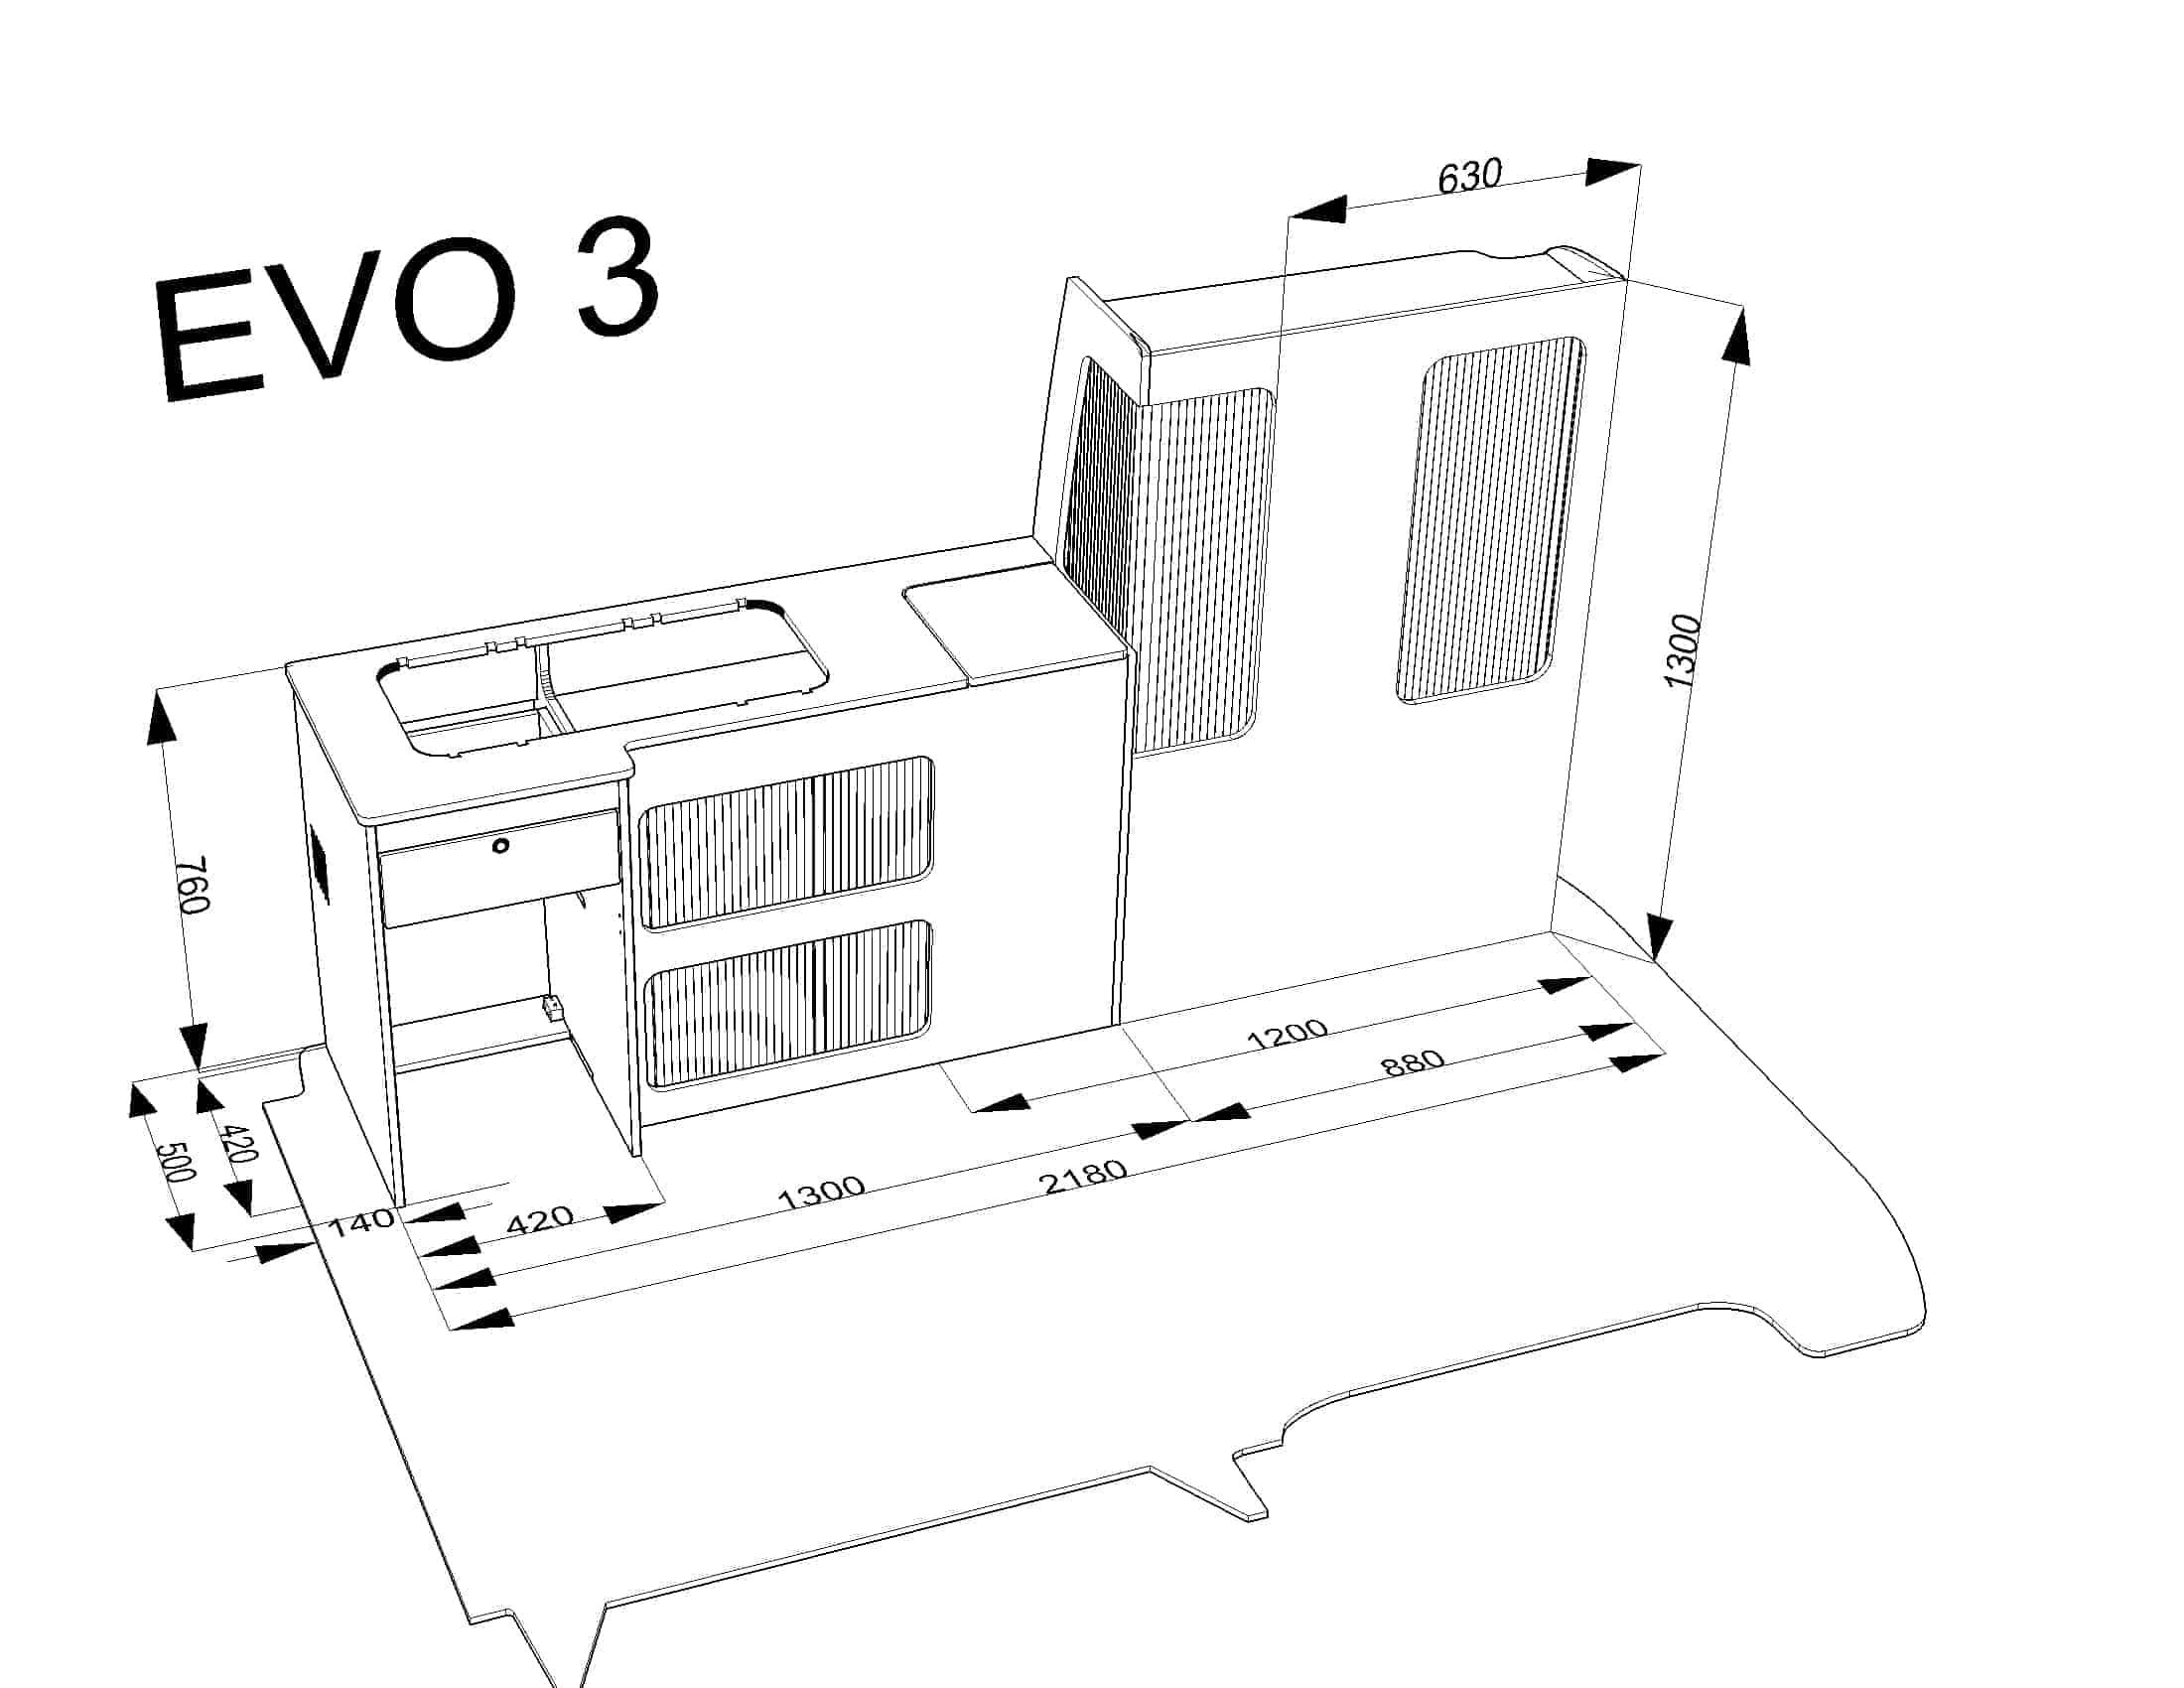 Evo 3 5 Short Wheel Base Van